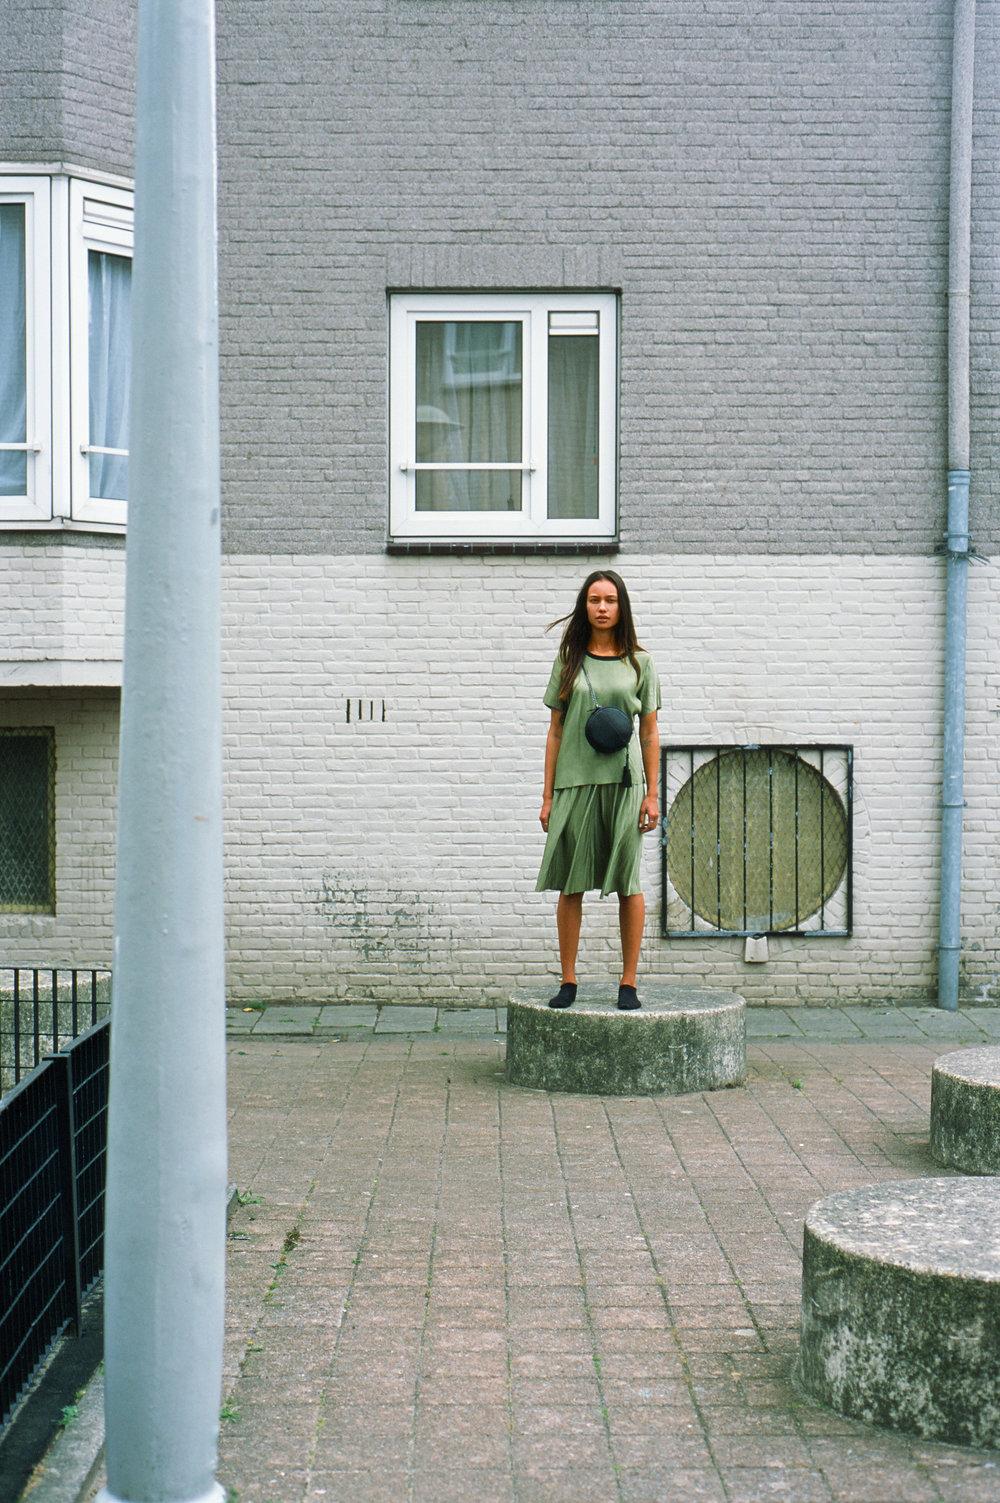 Roll 03-0012-Amsterdam-Adinda Denneman-FujiProvia-Edit.jpg